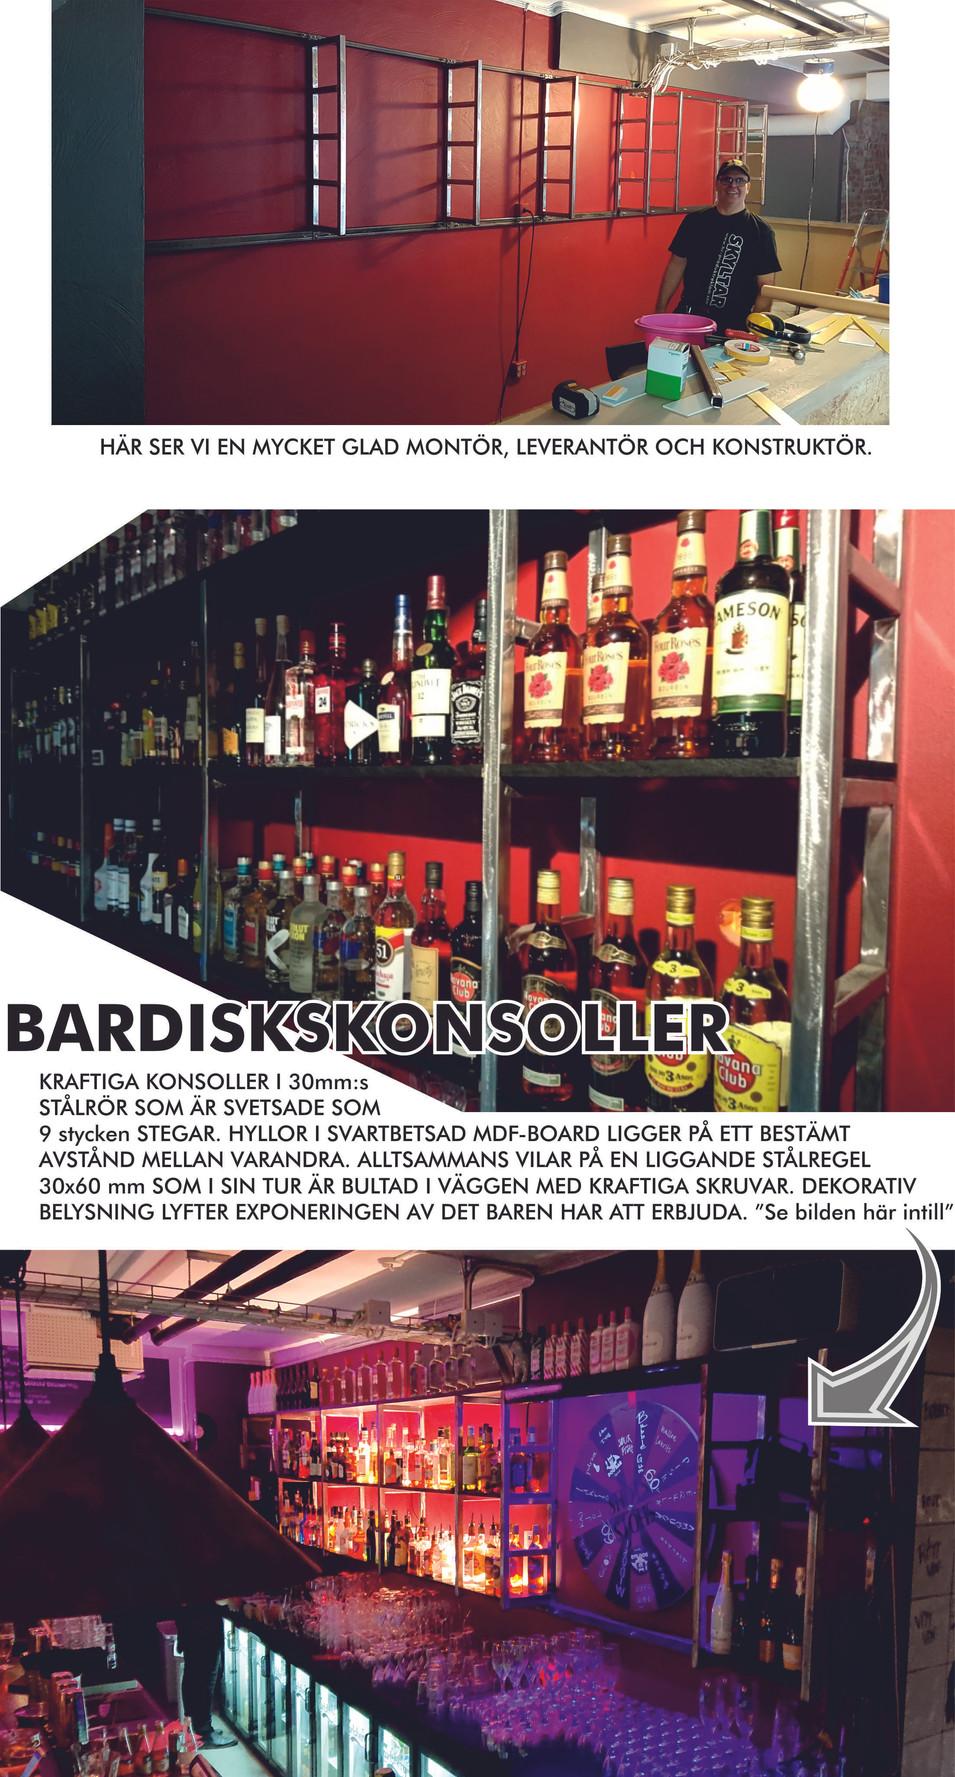 Barkonsoller info.jpg